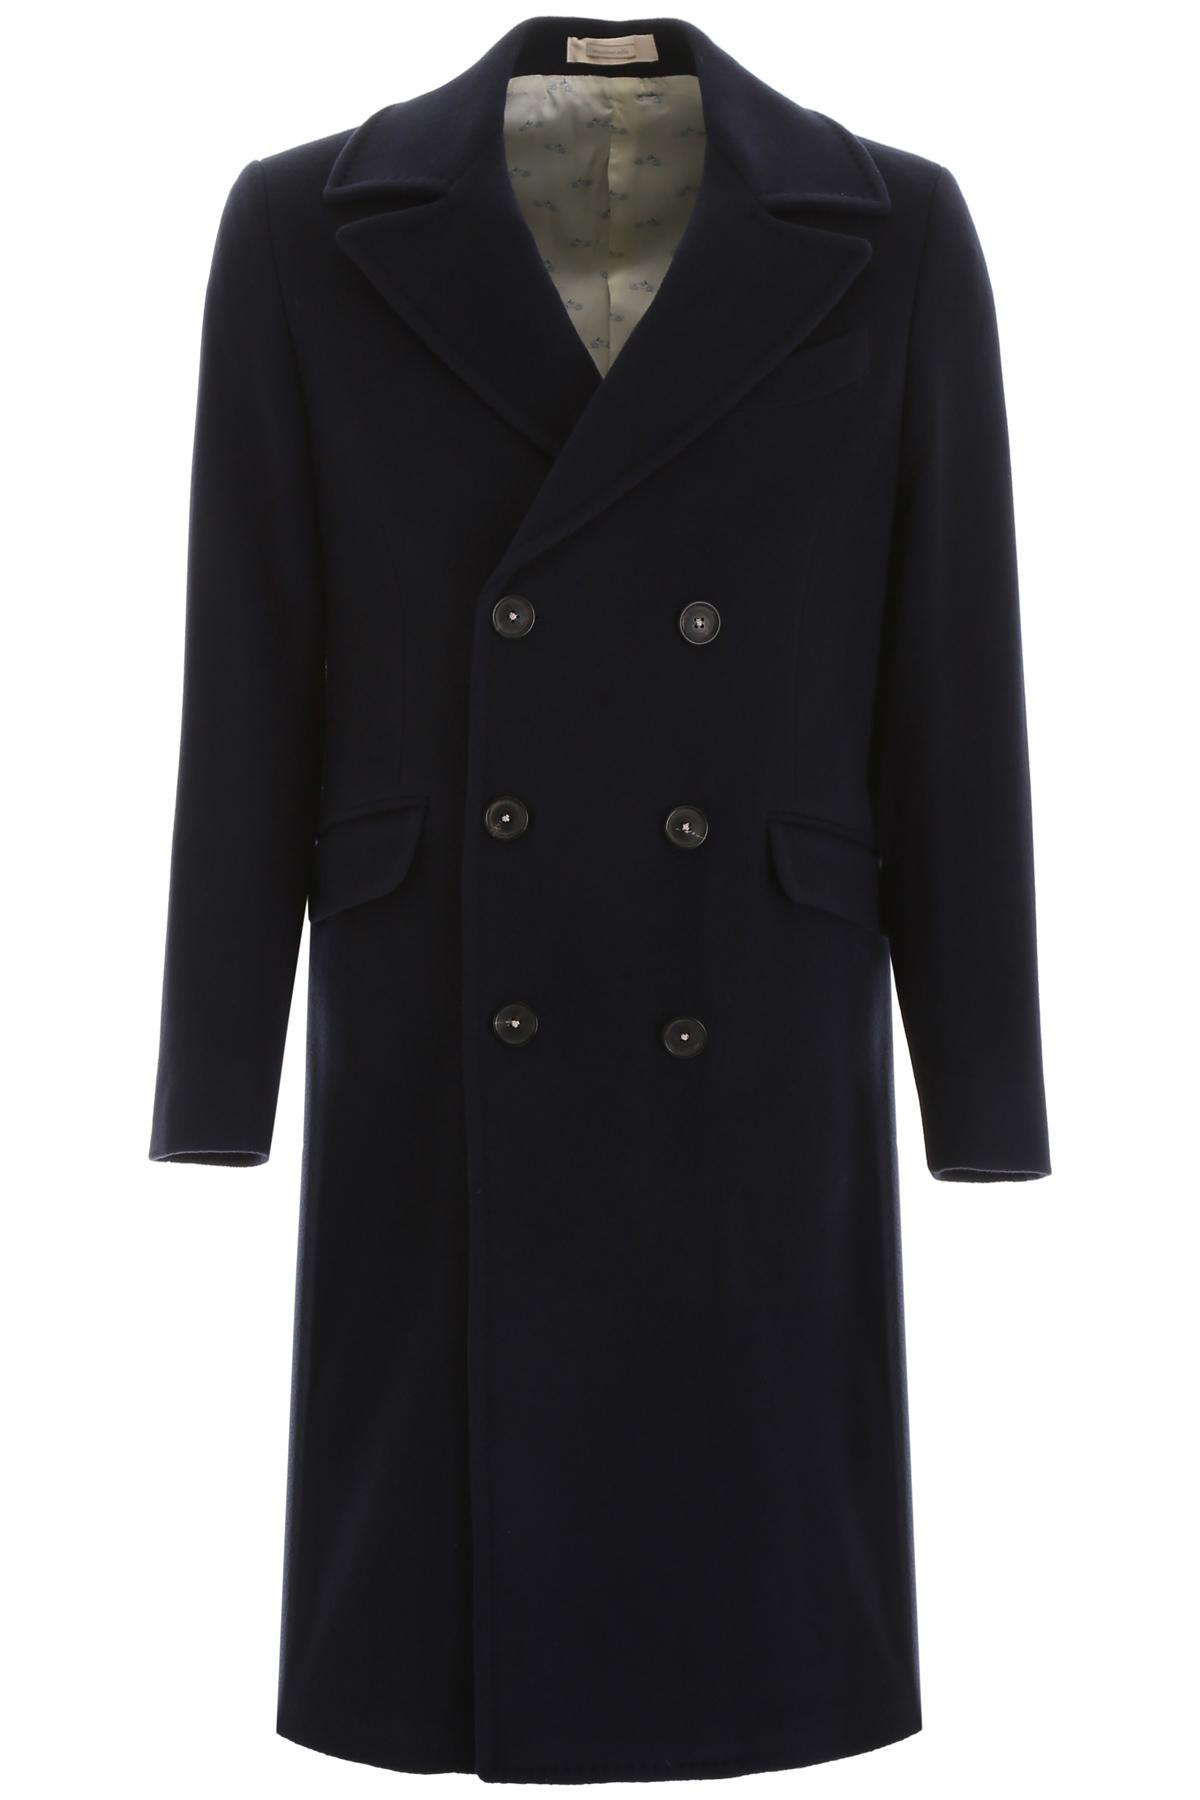 MASSIMO ALBA ALFA20 COAT 50 Blue Wool